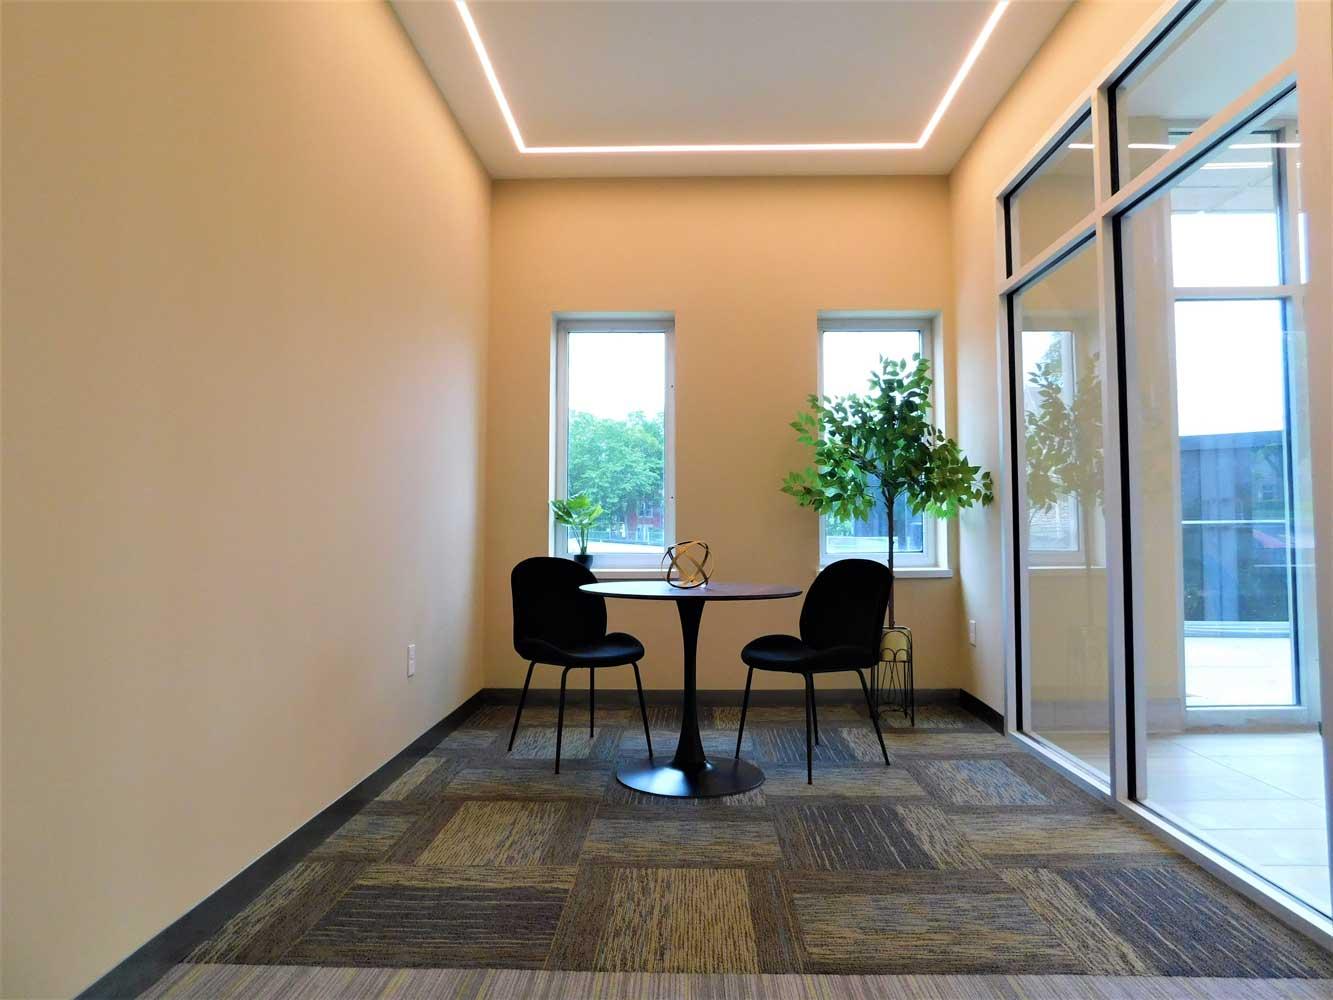 Google Fiber Installed at Midtown Plaza Apartments in Kansas City, MO